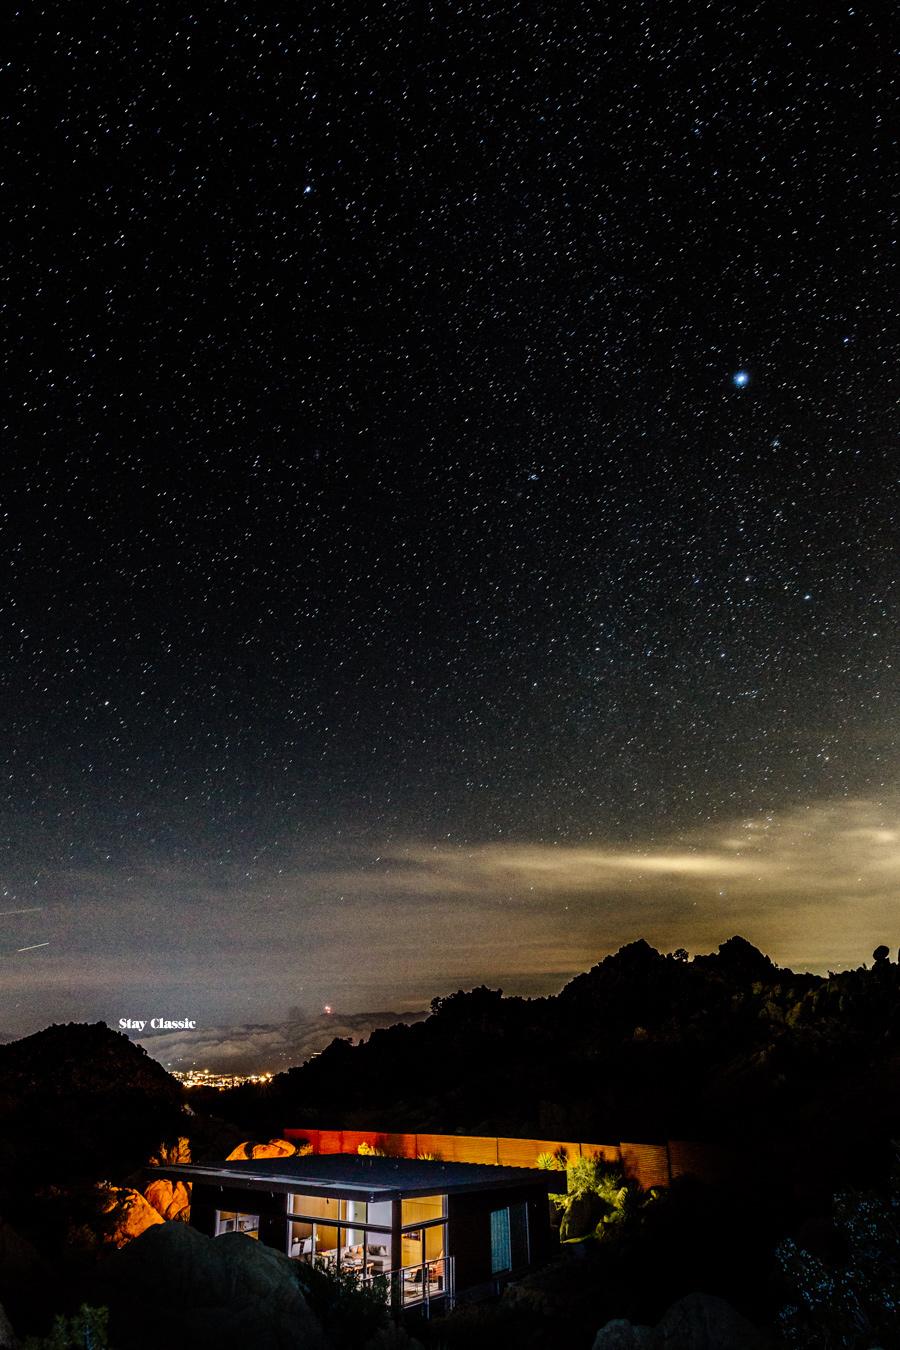 Decent amount of stars